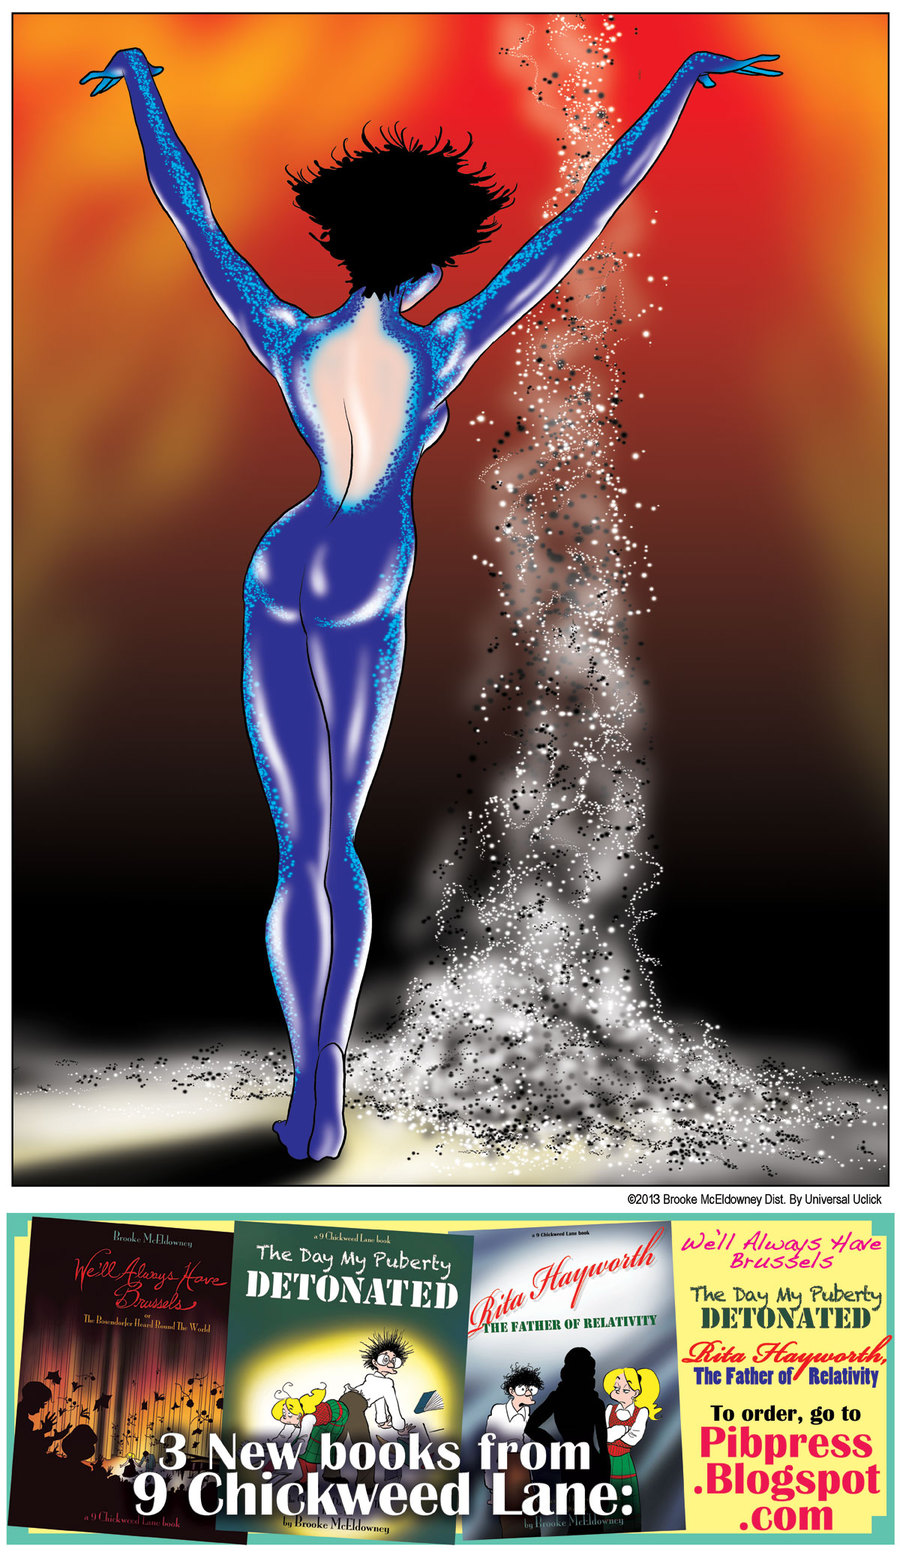 Pibgorn for Mar 21, 2013 Comic Strip